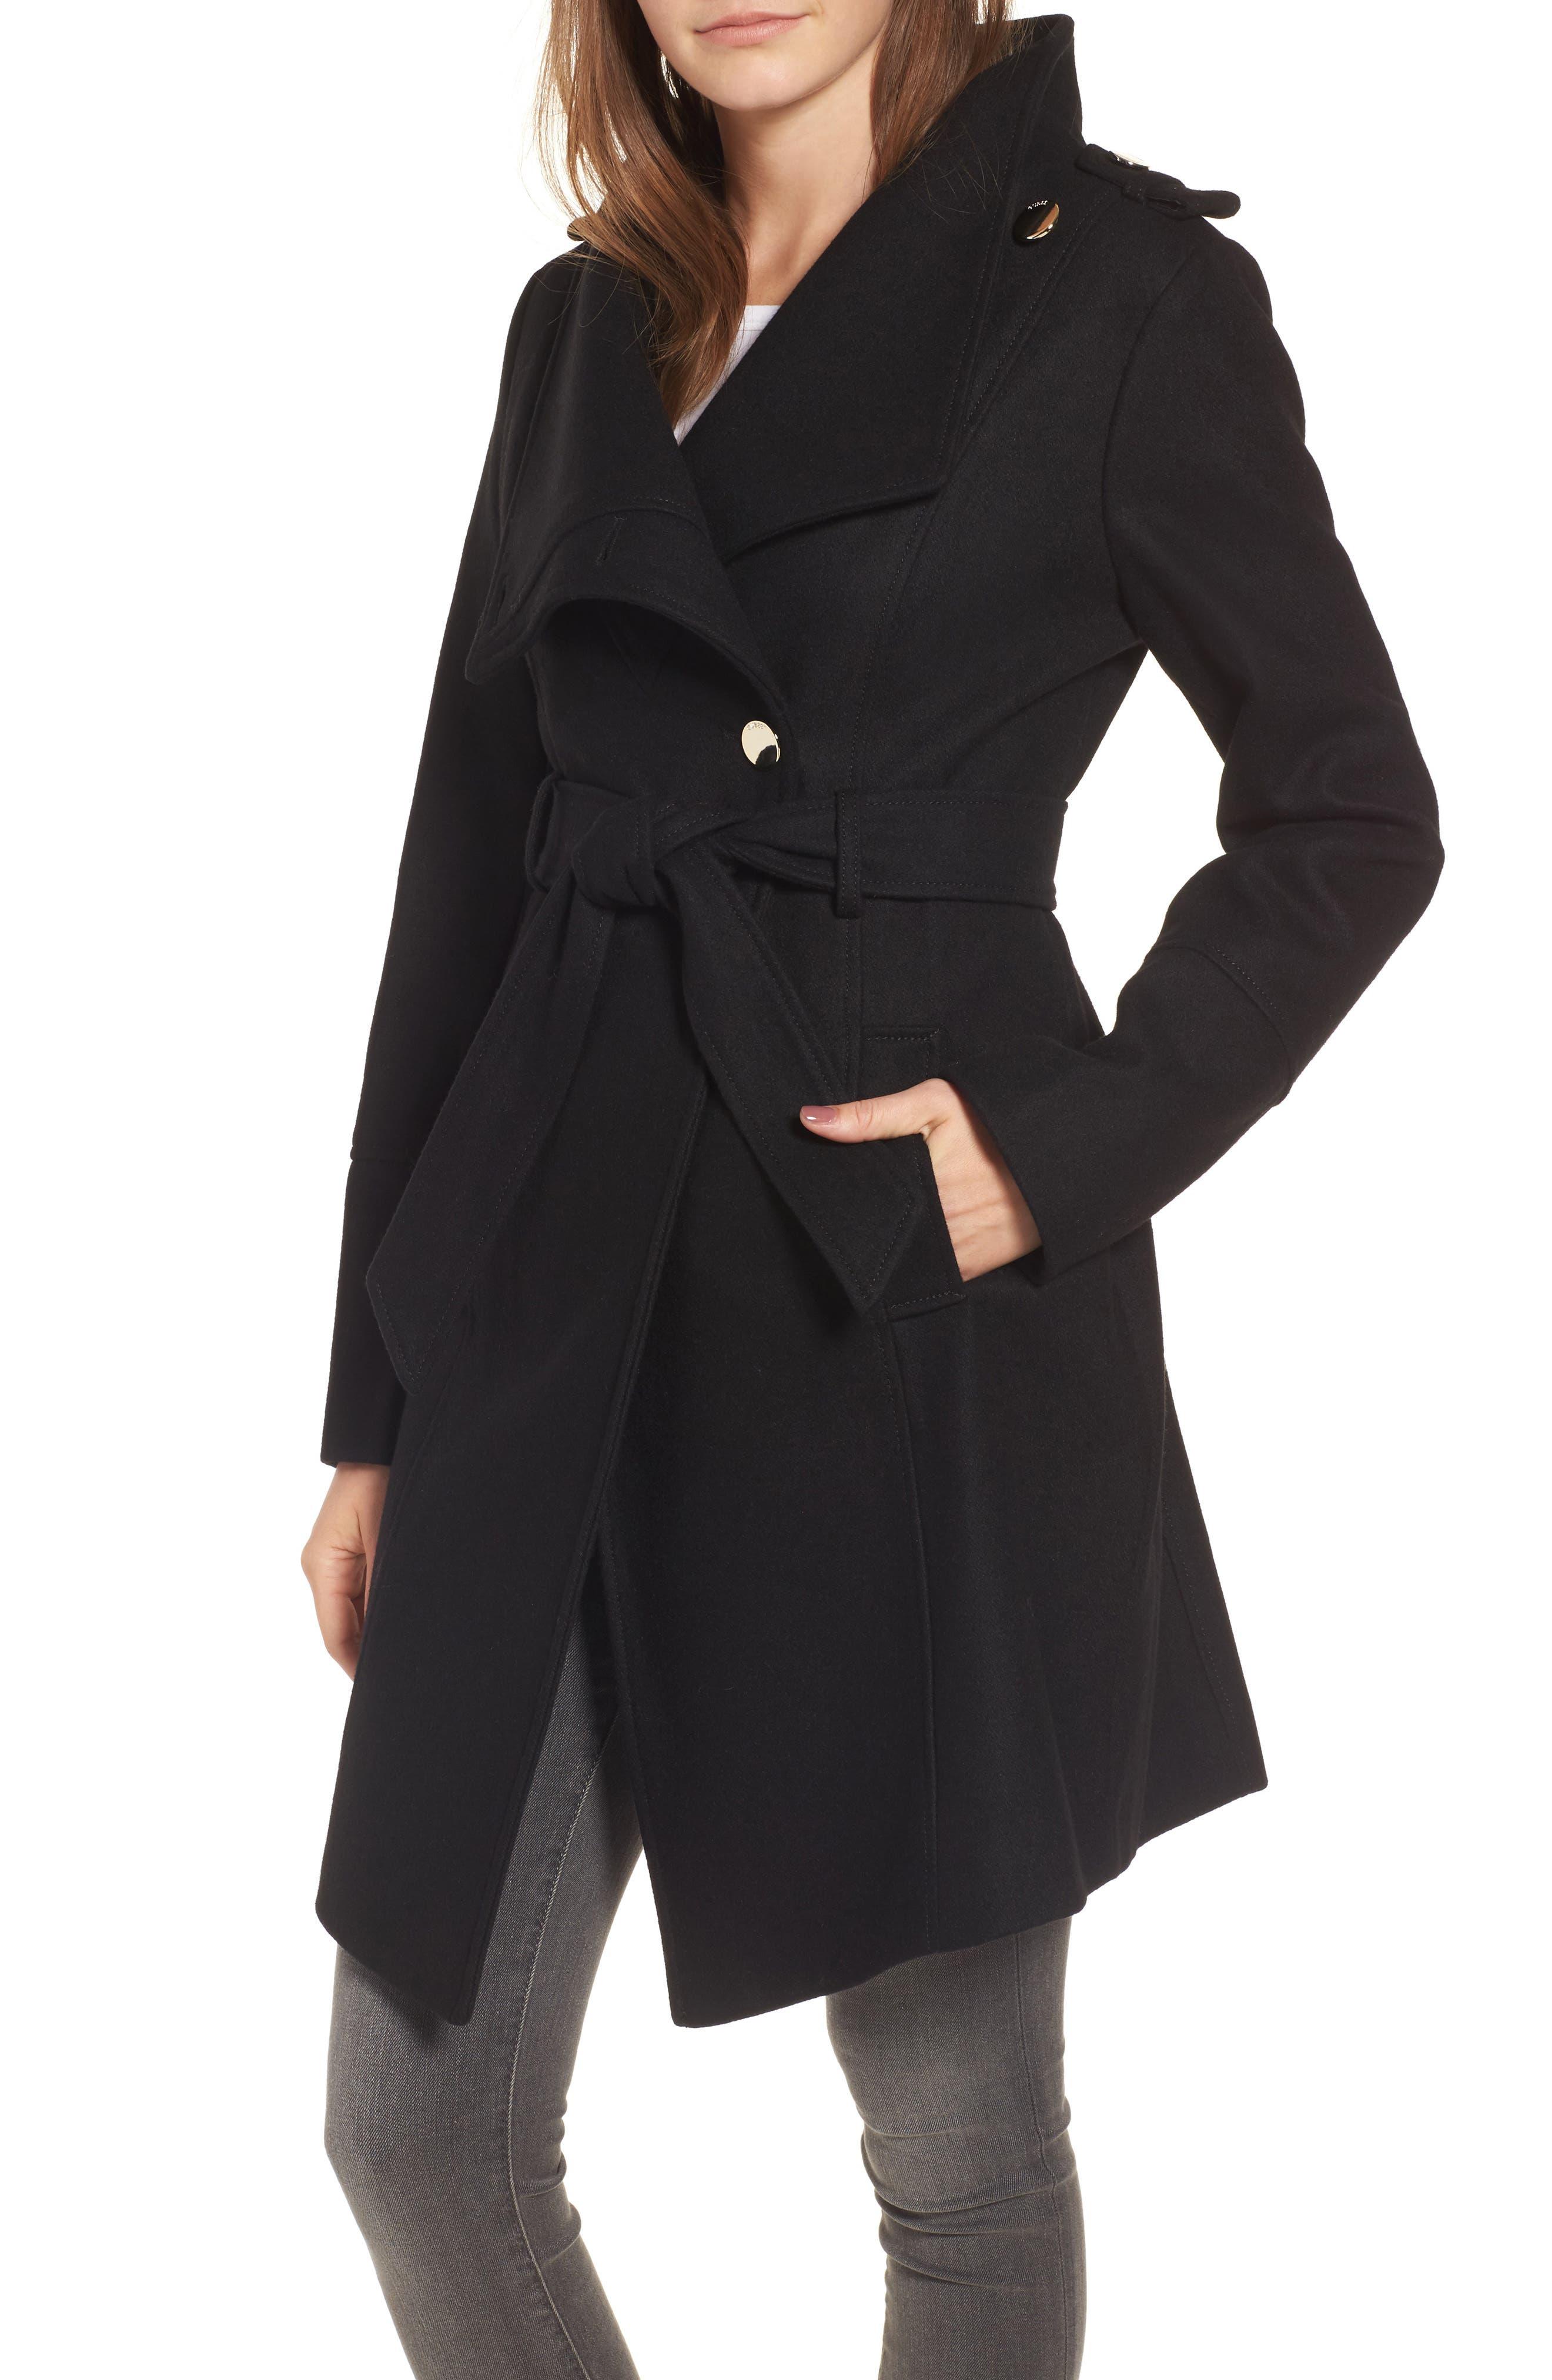 Wrap Trench Coat,                             Main thumbnail 1, color,                             Black